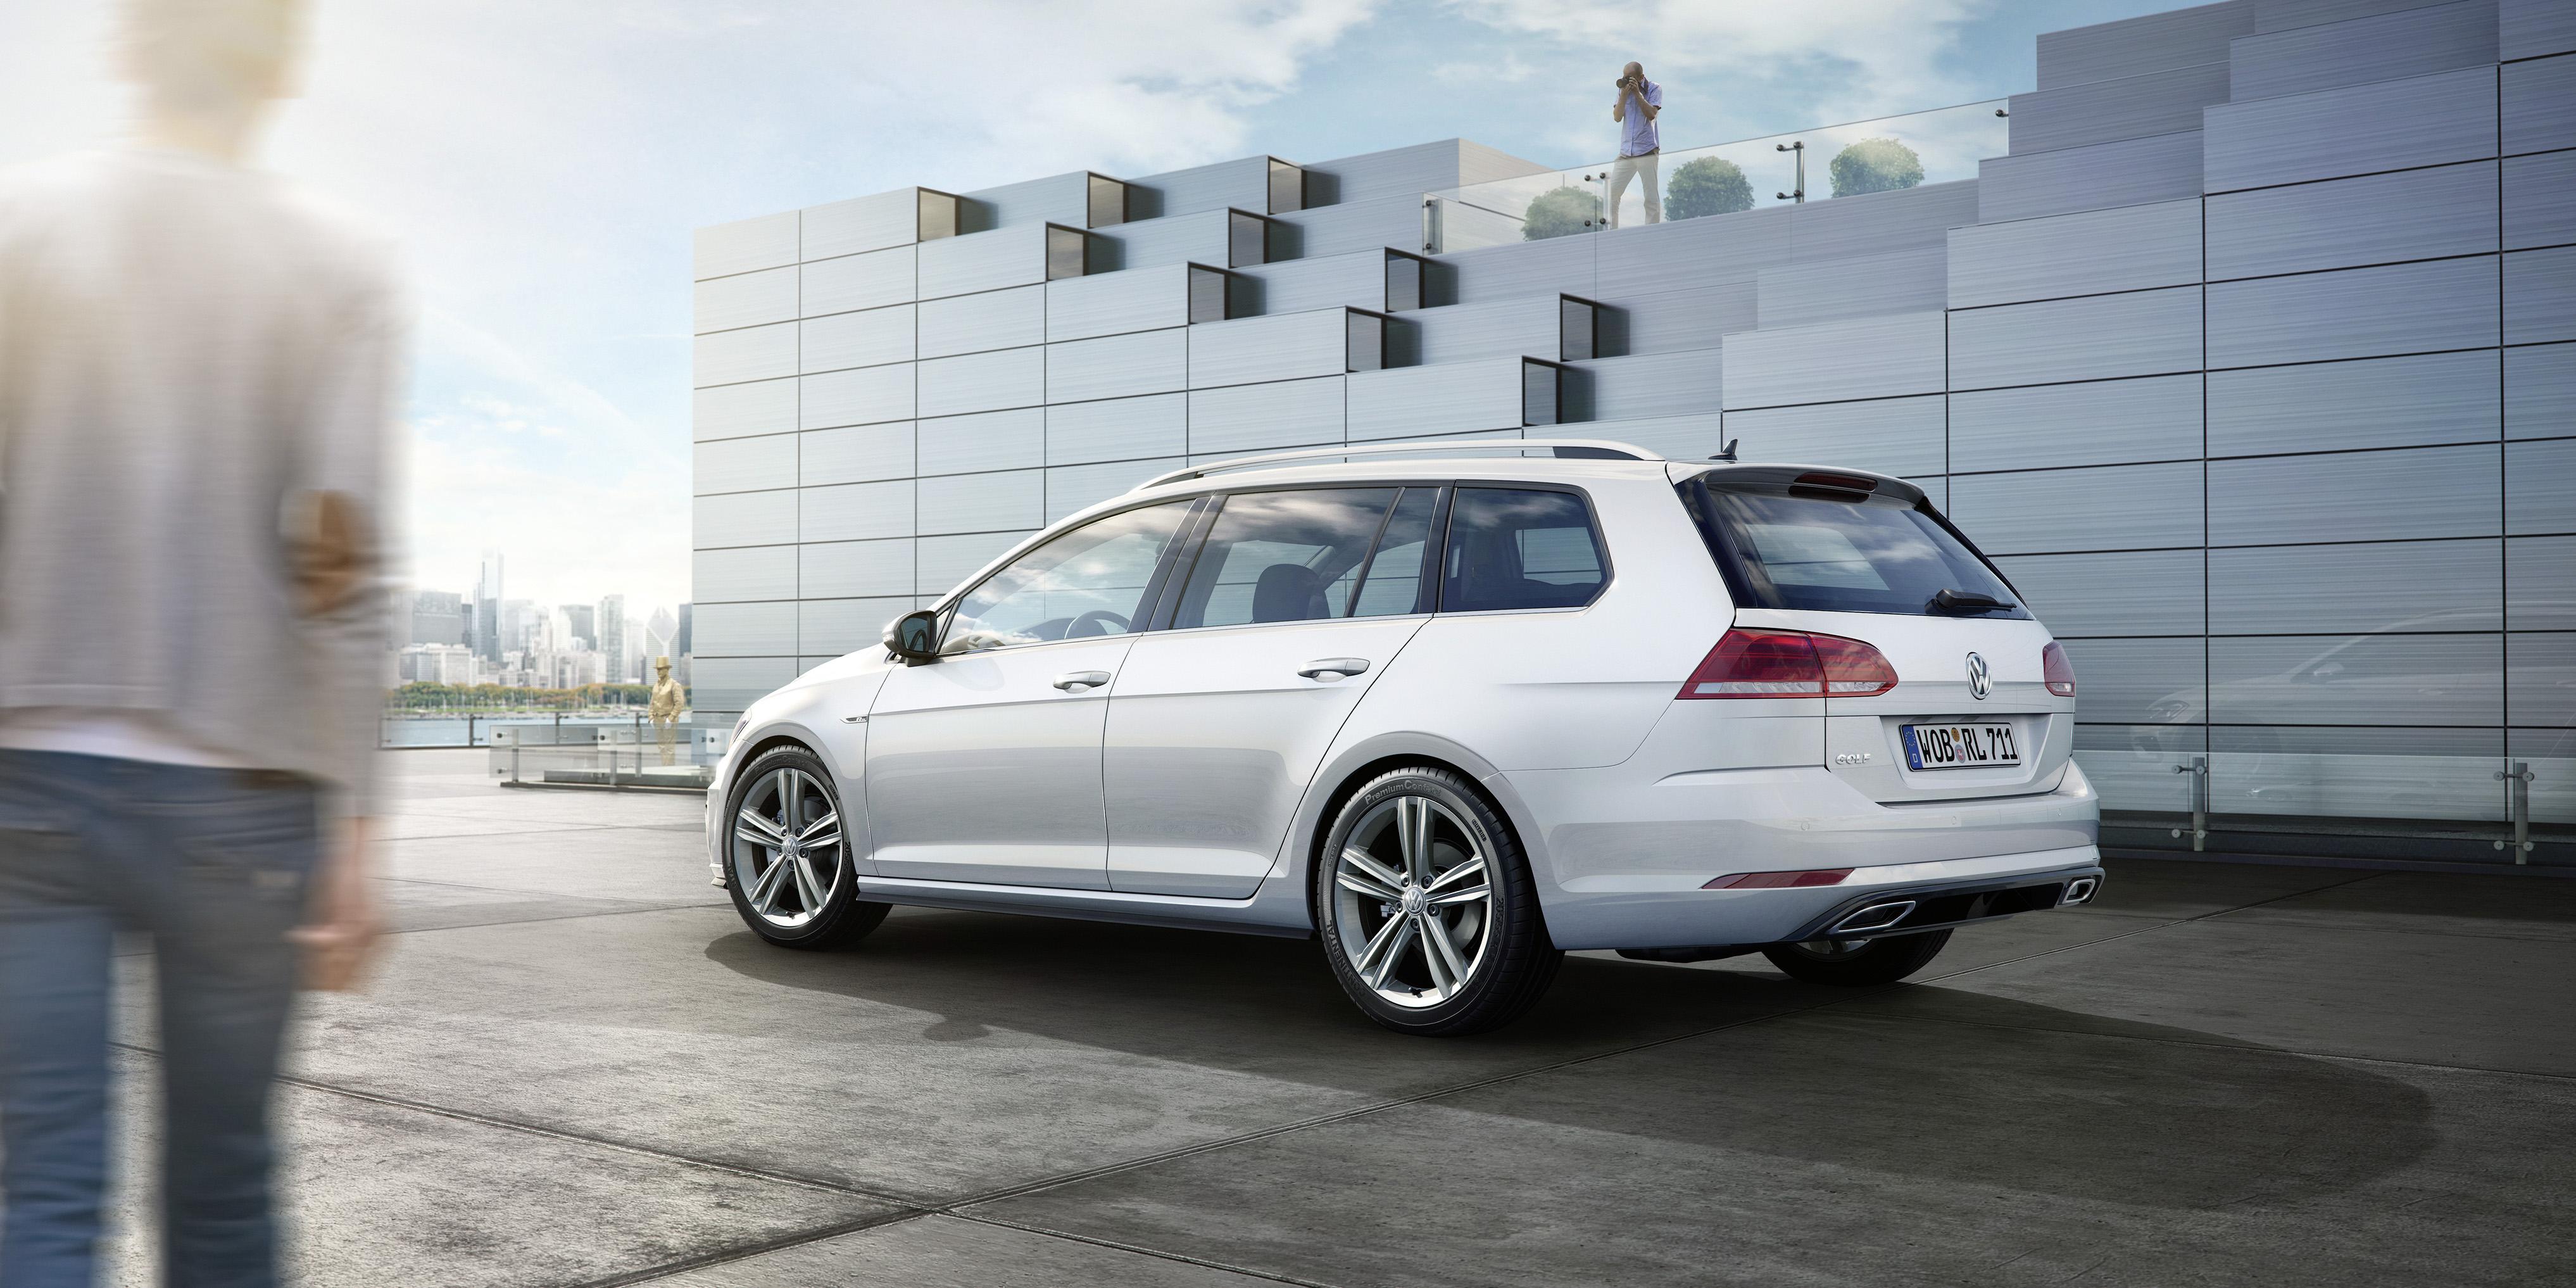 2017 Volkswagen Golf Gets 1 0 Tsi 85 Hp Base Engine Awd For 2 Tdi